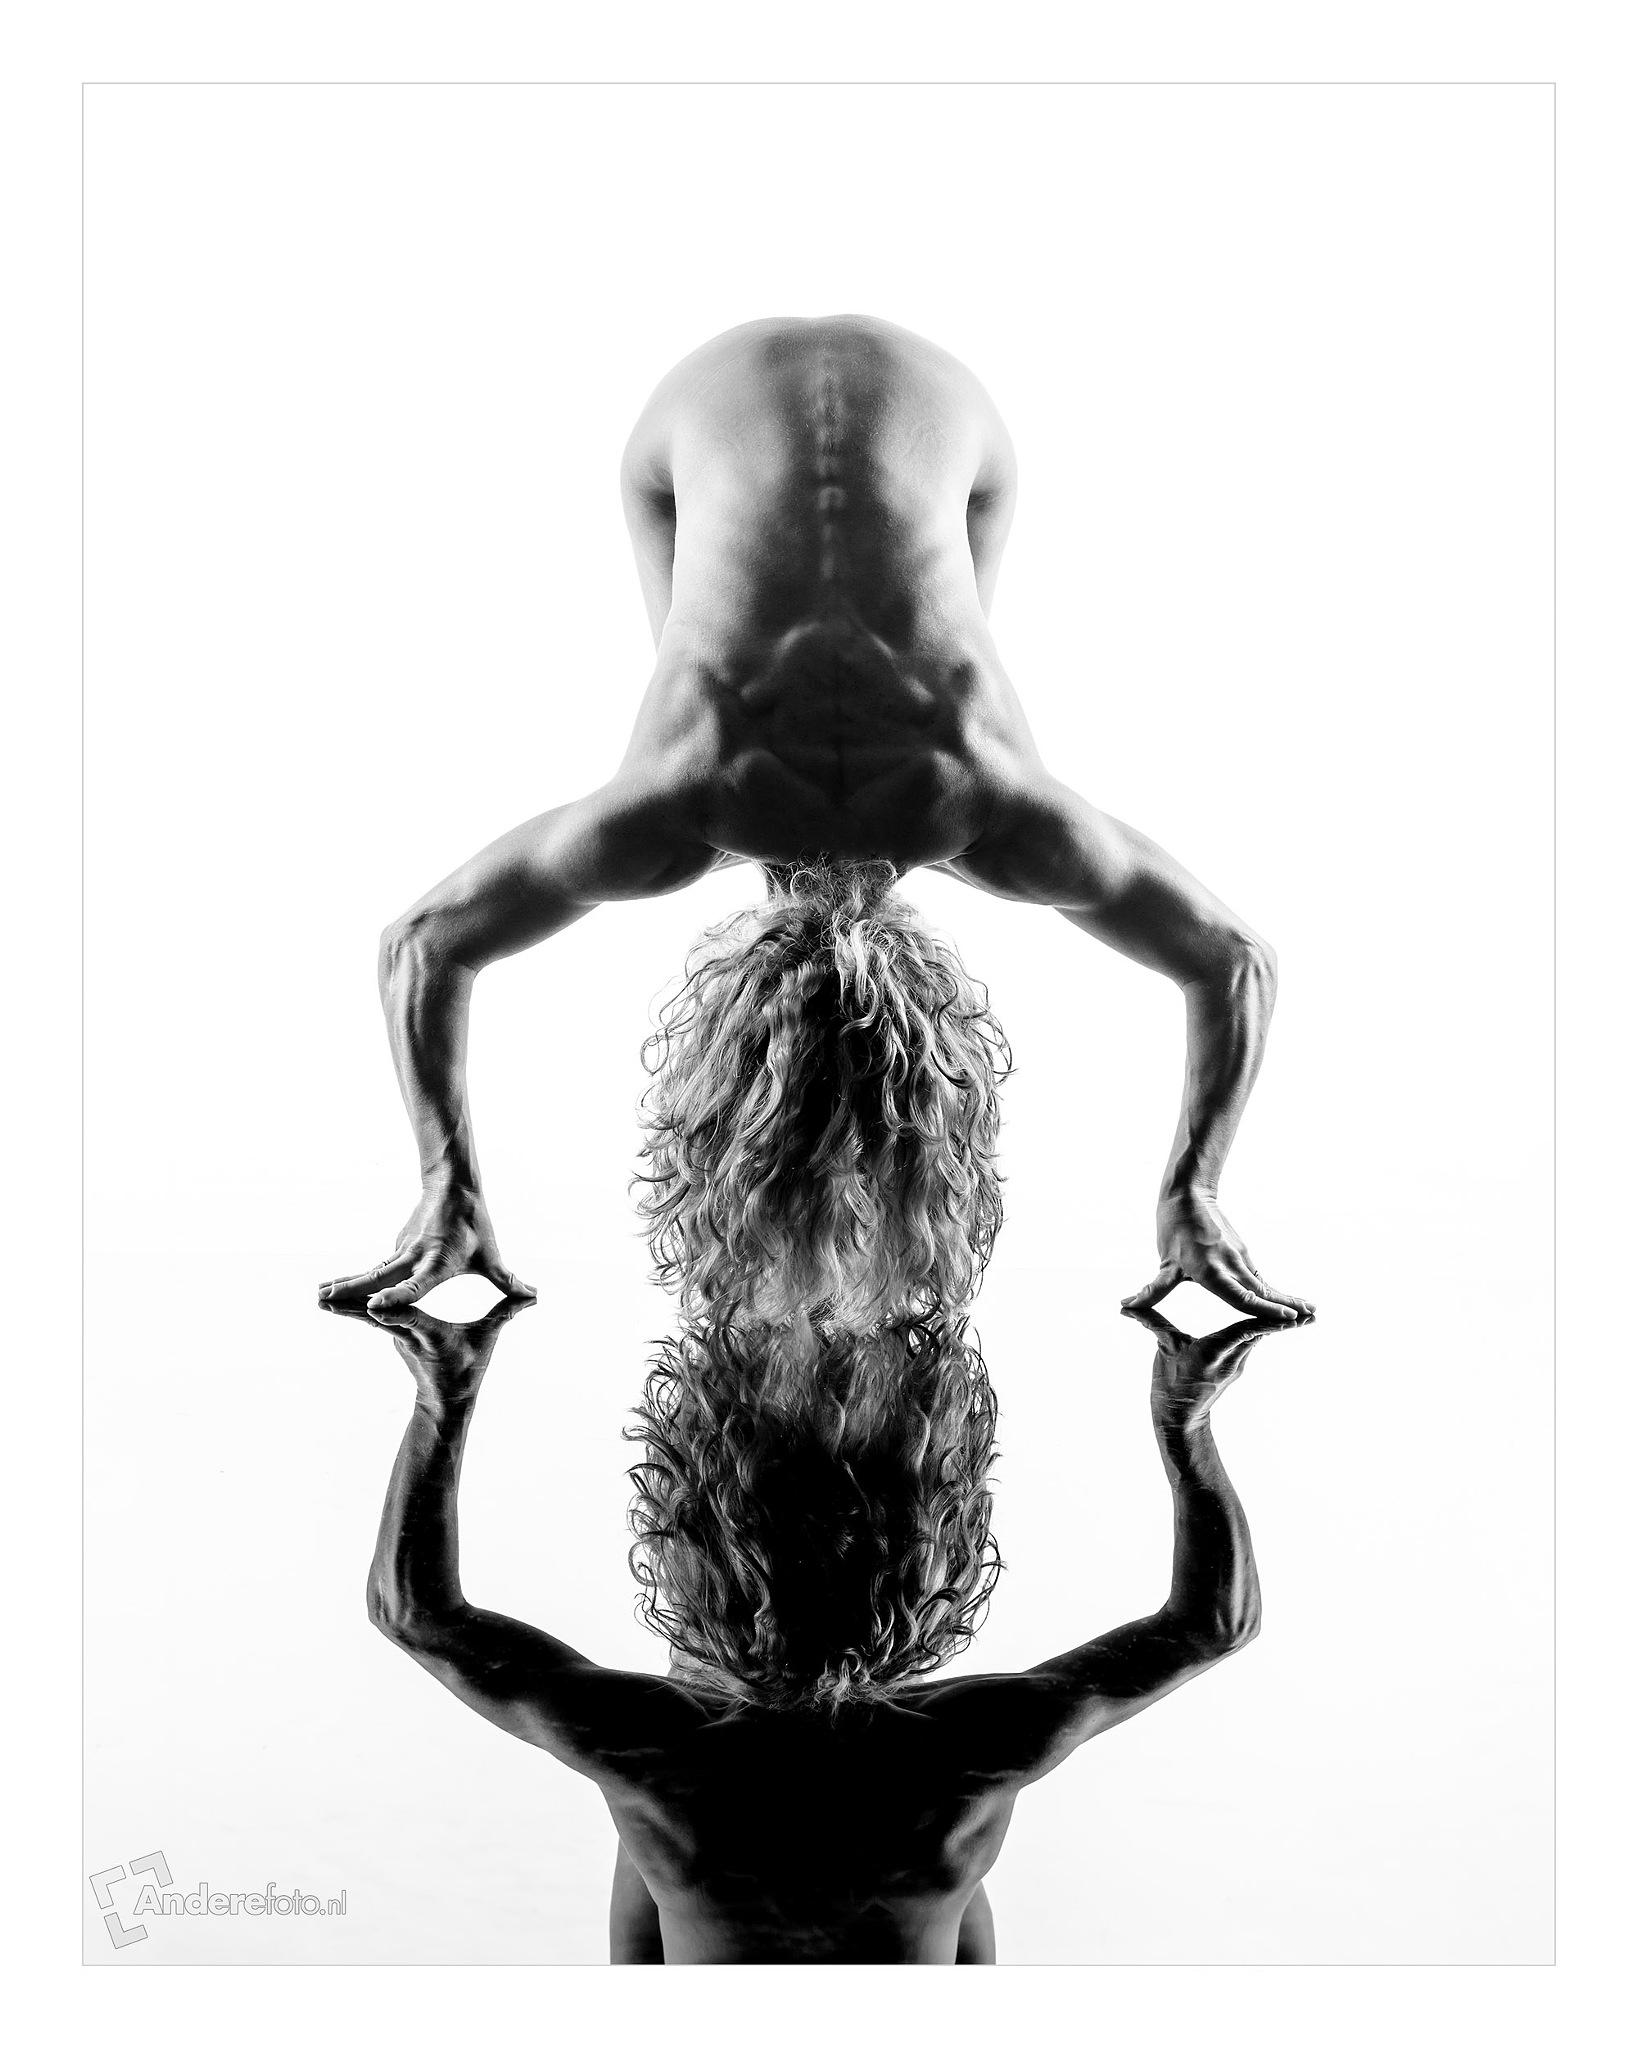 muscular by Serge Duursma